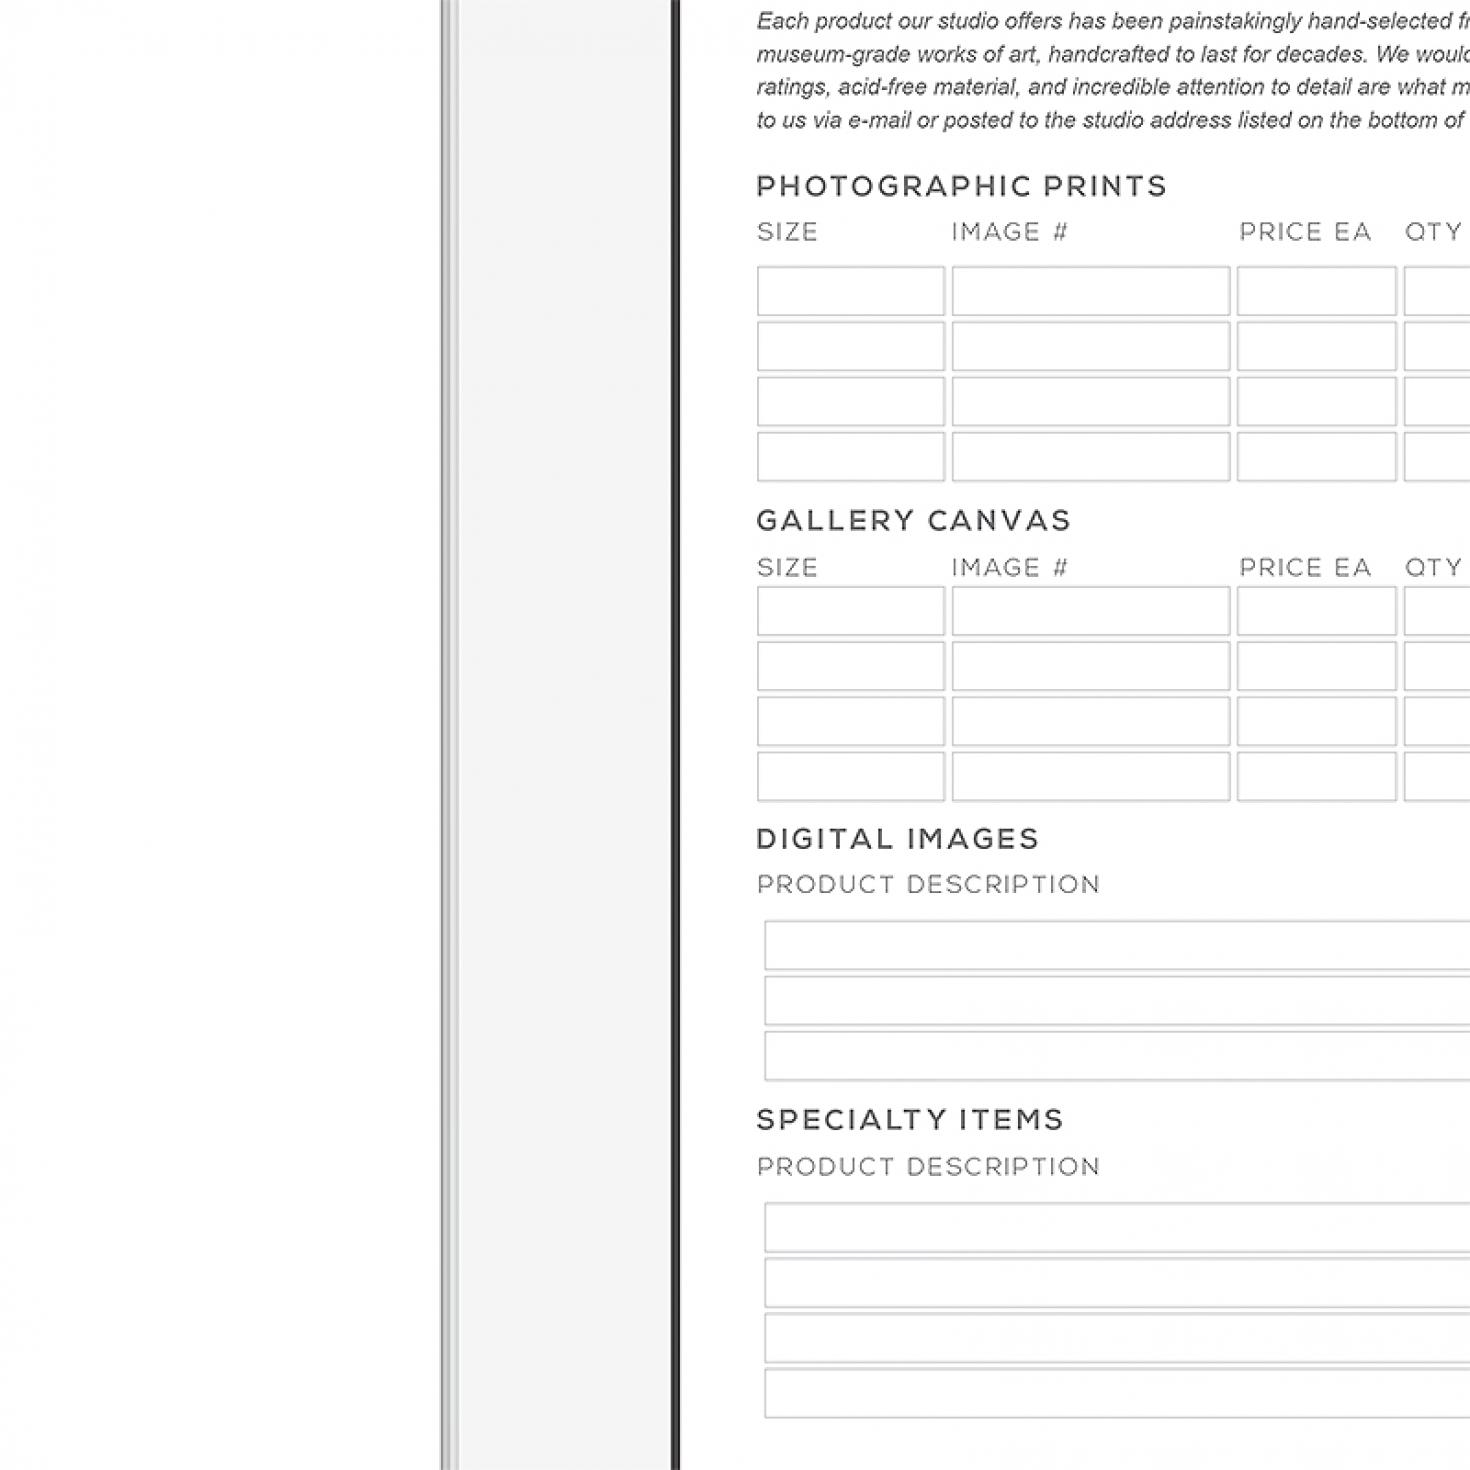 Interactive Studio Order Form Shopgalleree Photography